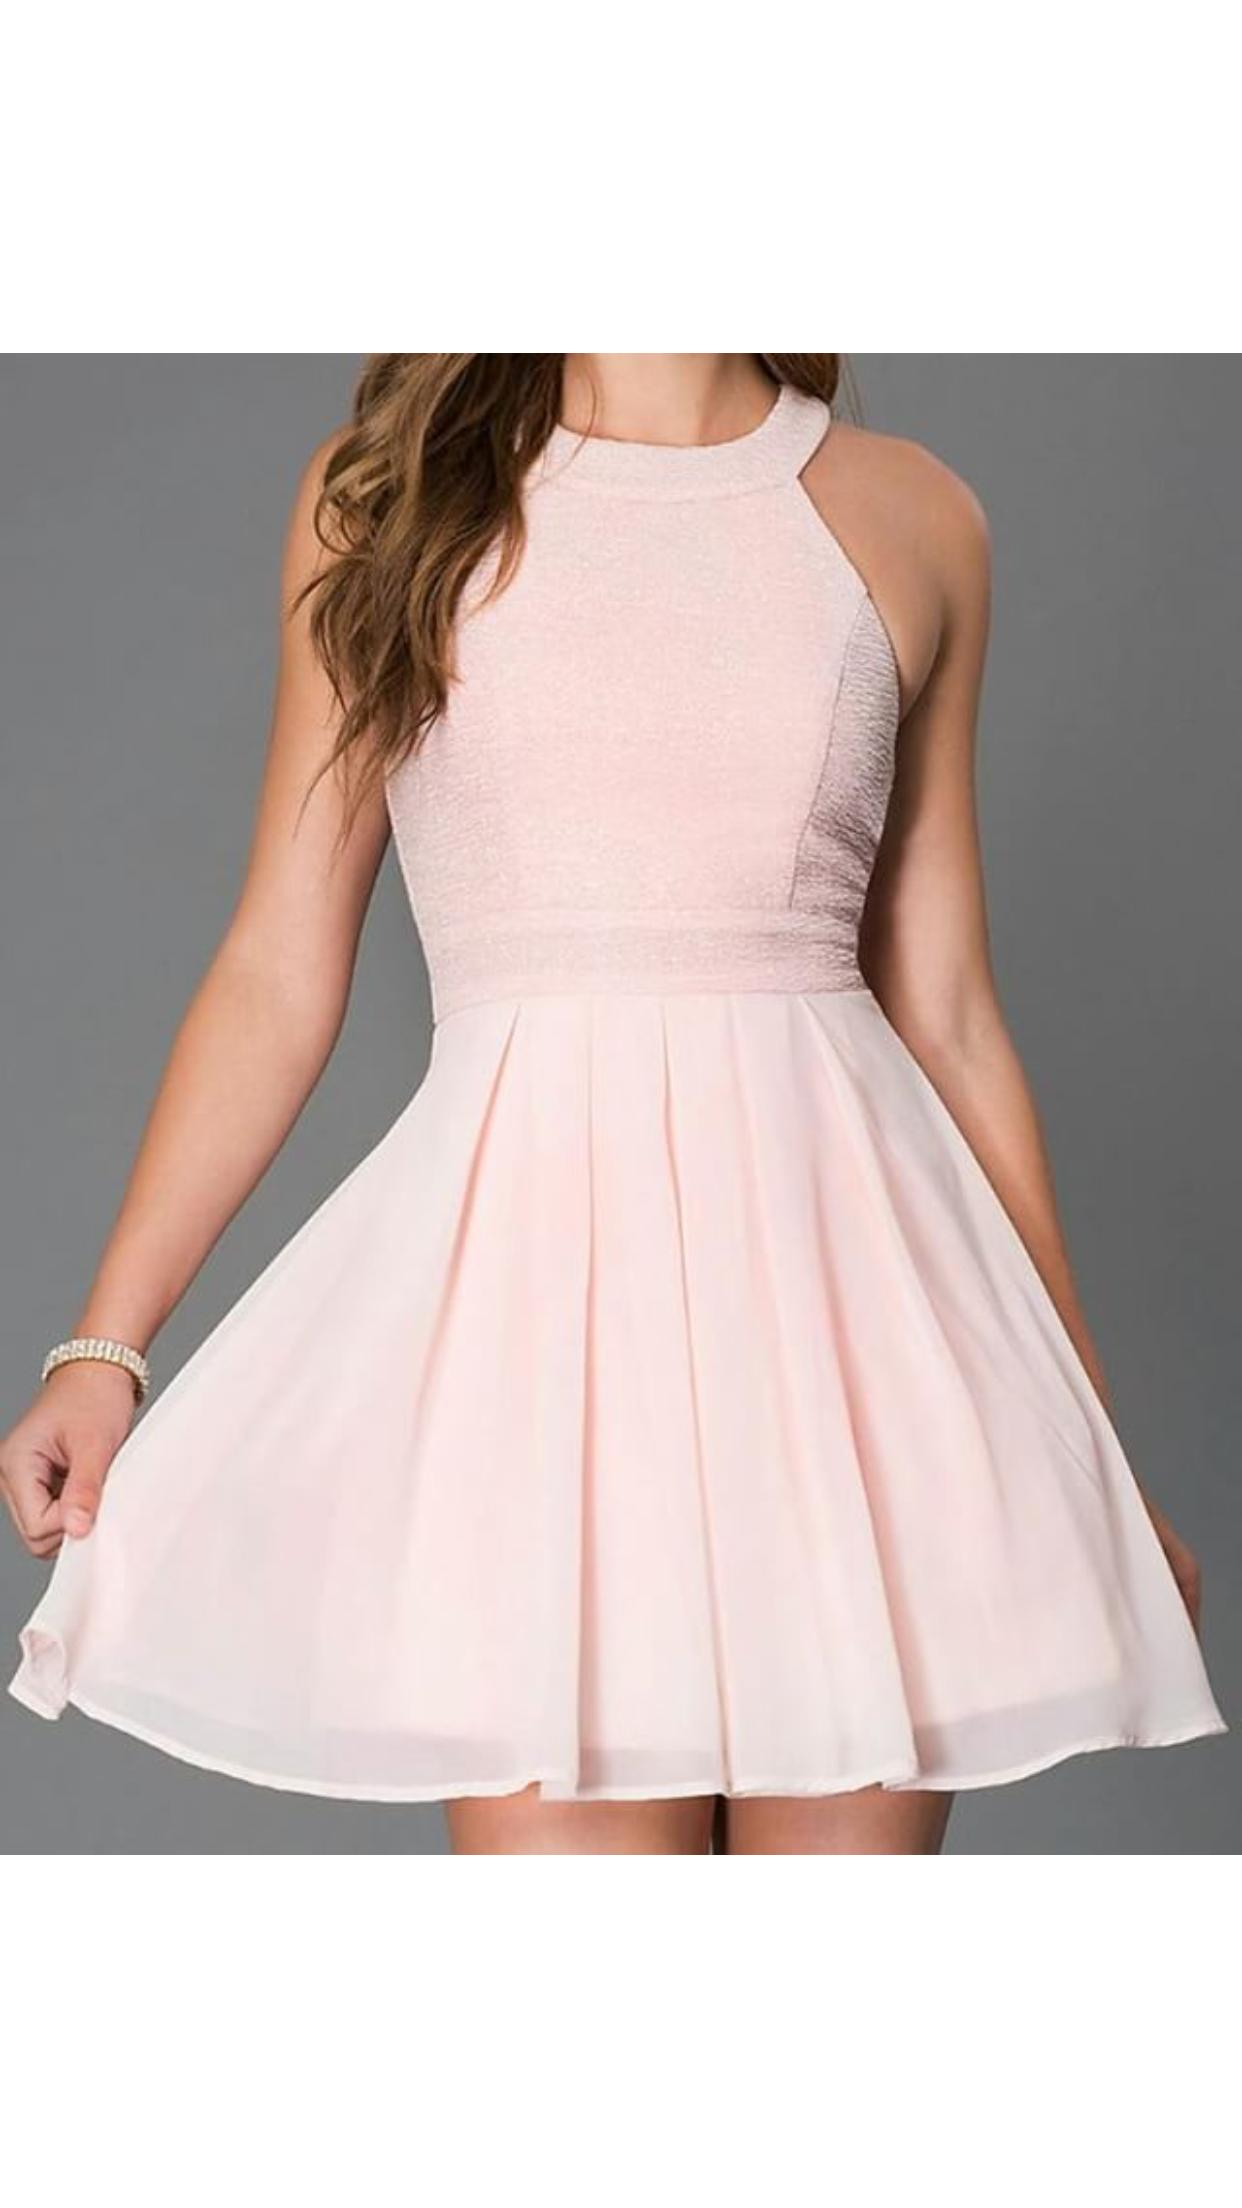 Vestido Corto Elegante Sencillo Rosa Pastel En 2019